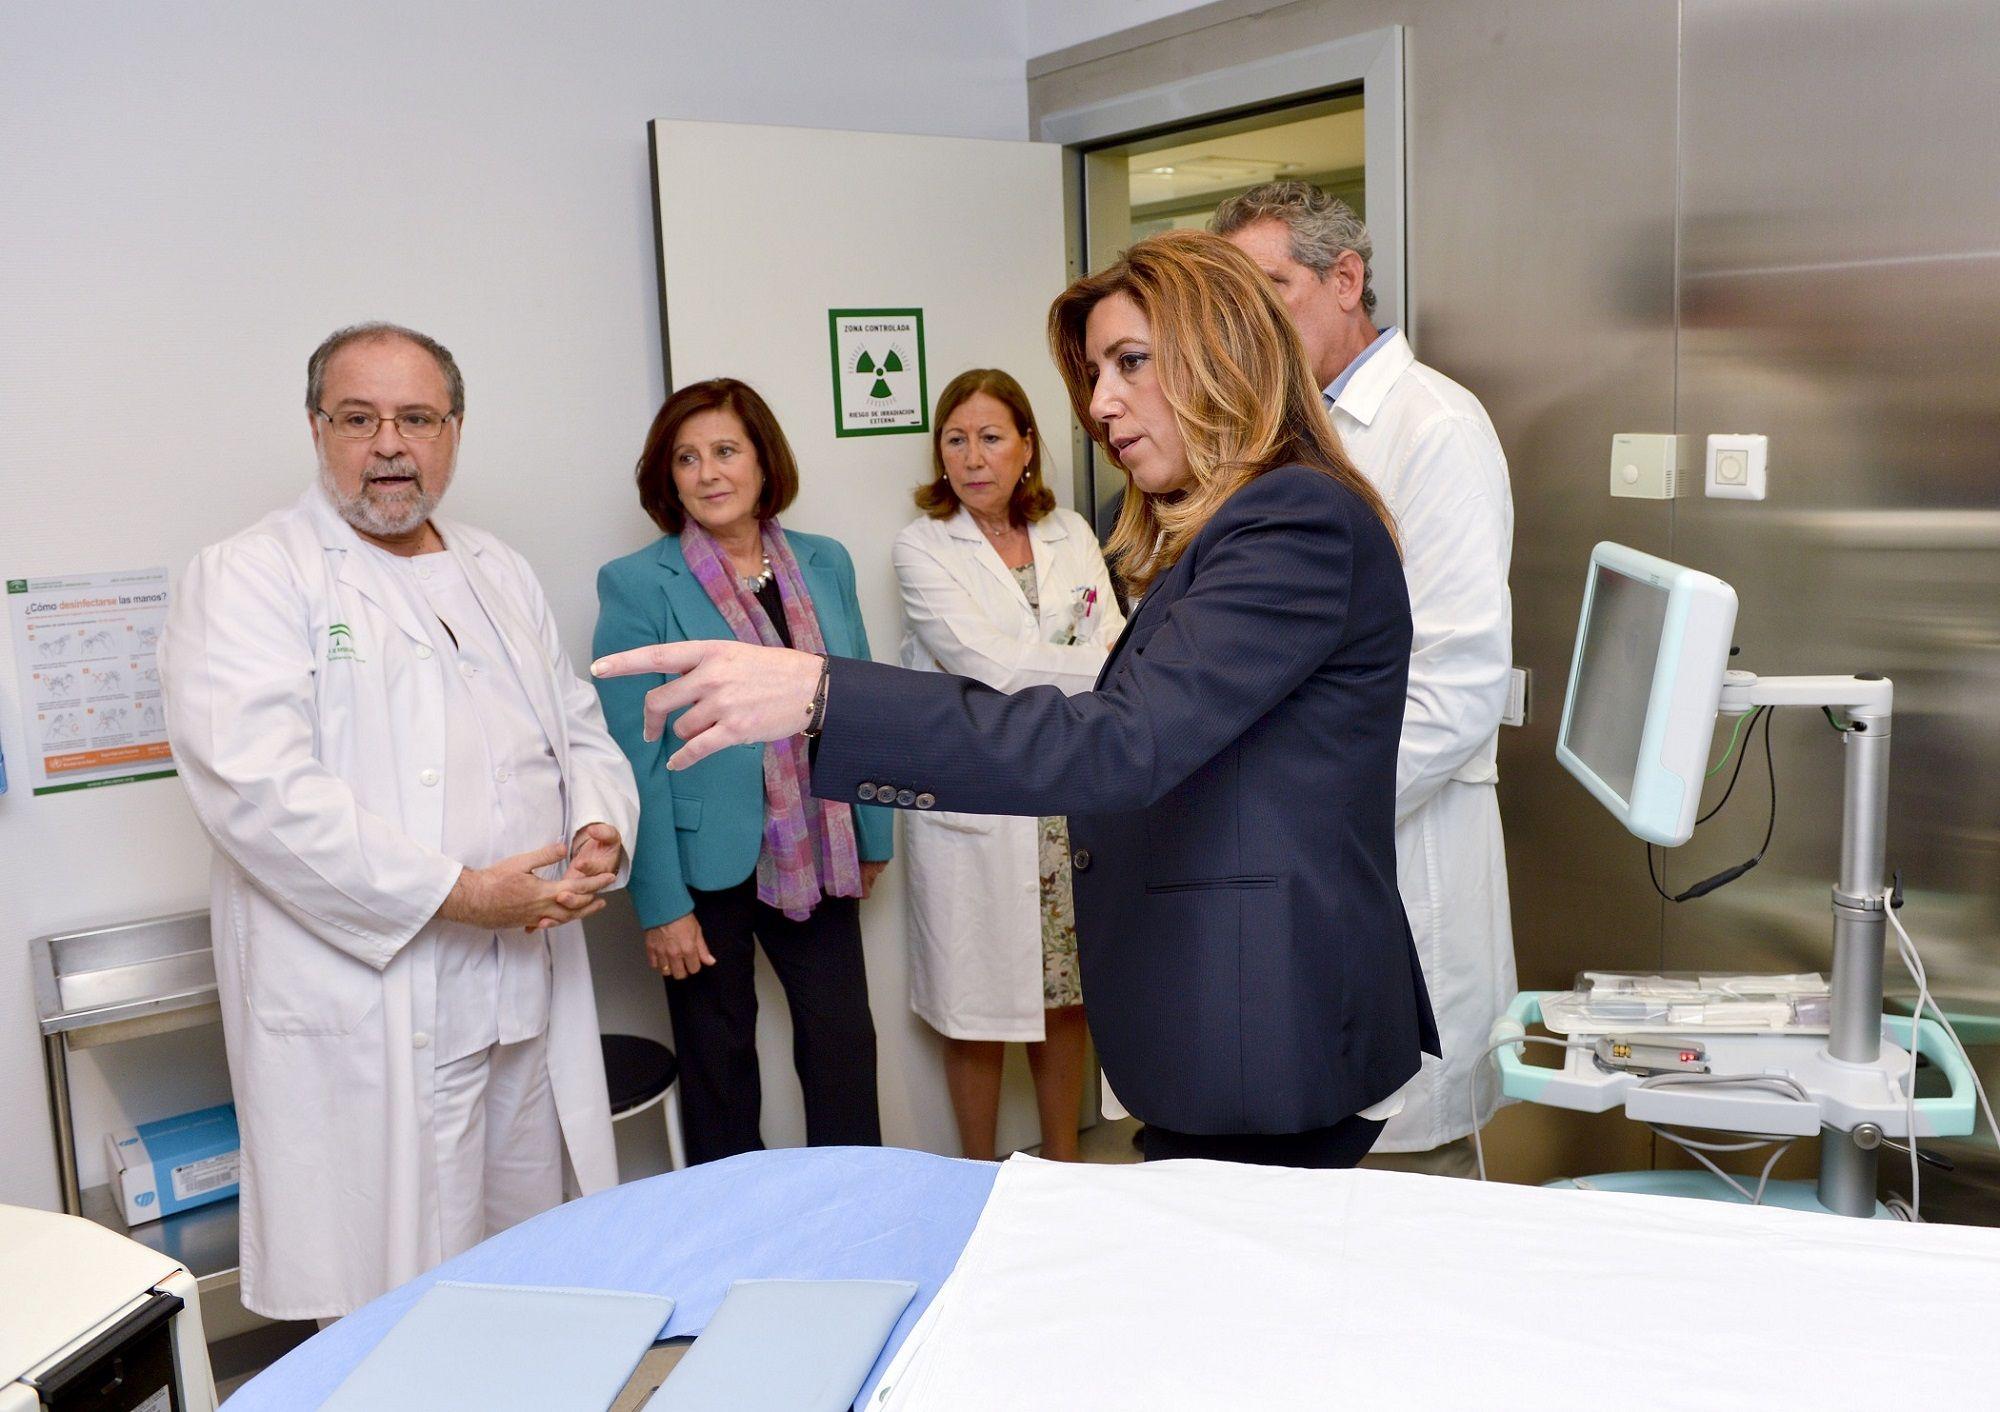 SAS Junta Andalucia Hospital Valme